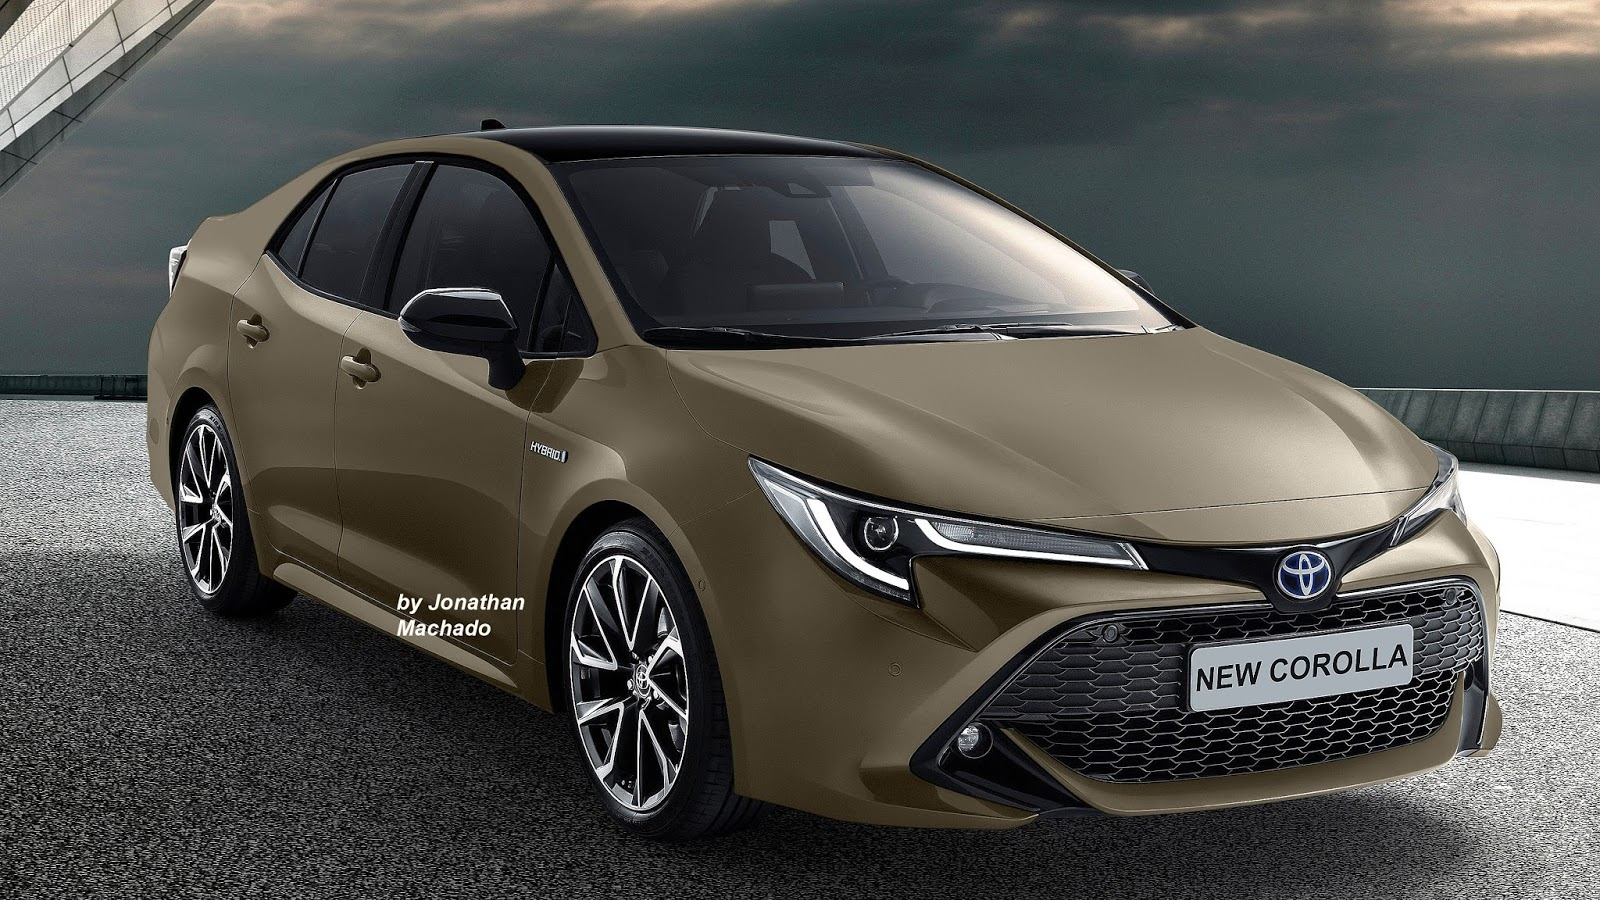 next-gen-2019-toyota-corolla-sedan-brown-pictures-photos-images